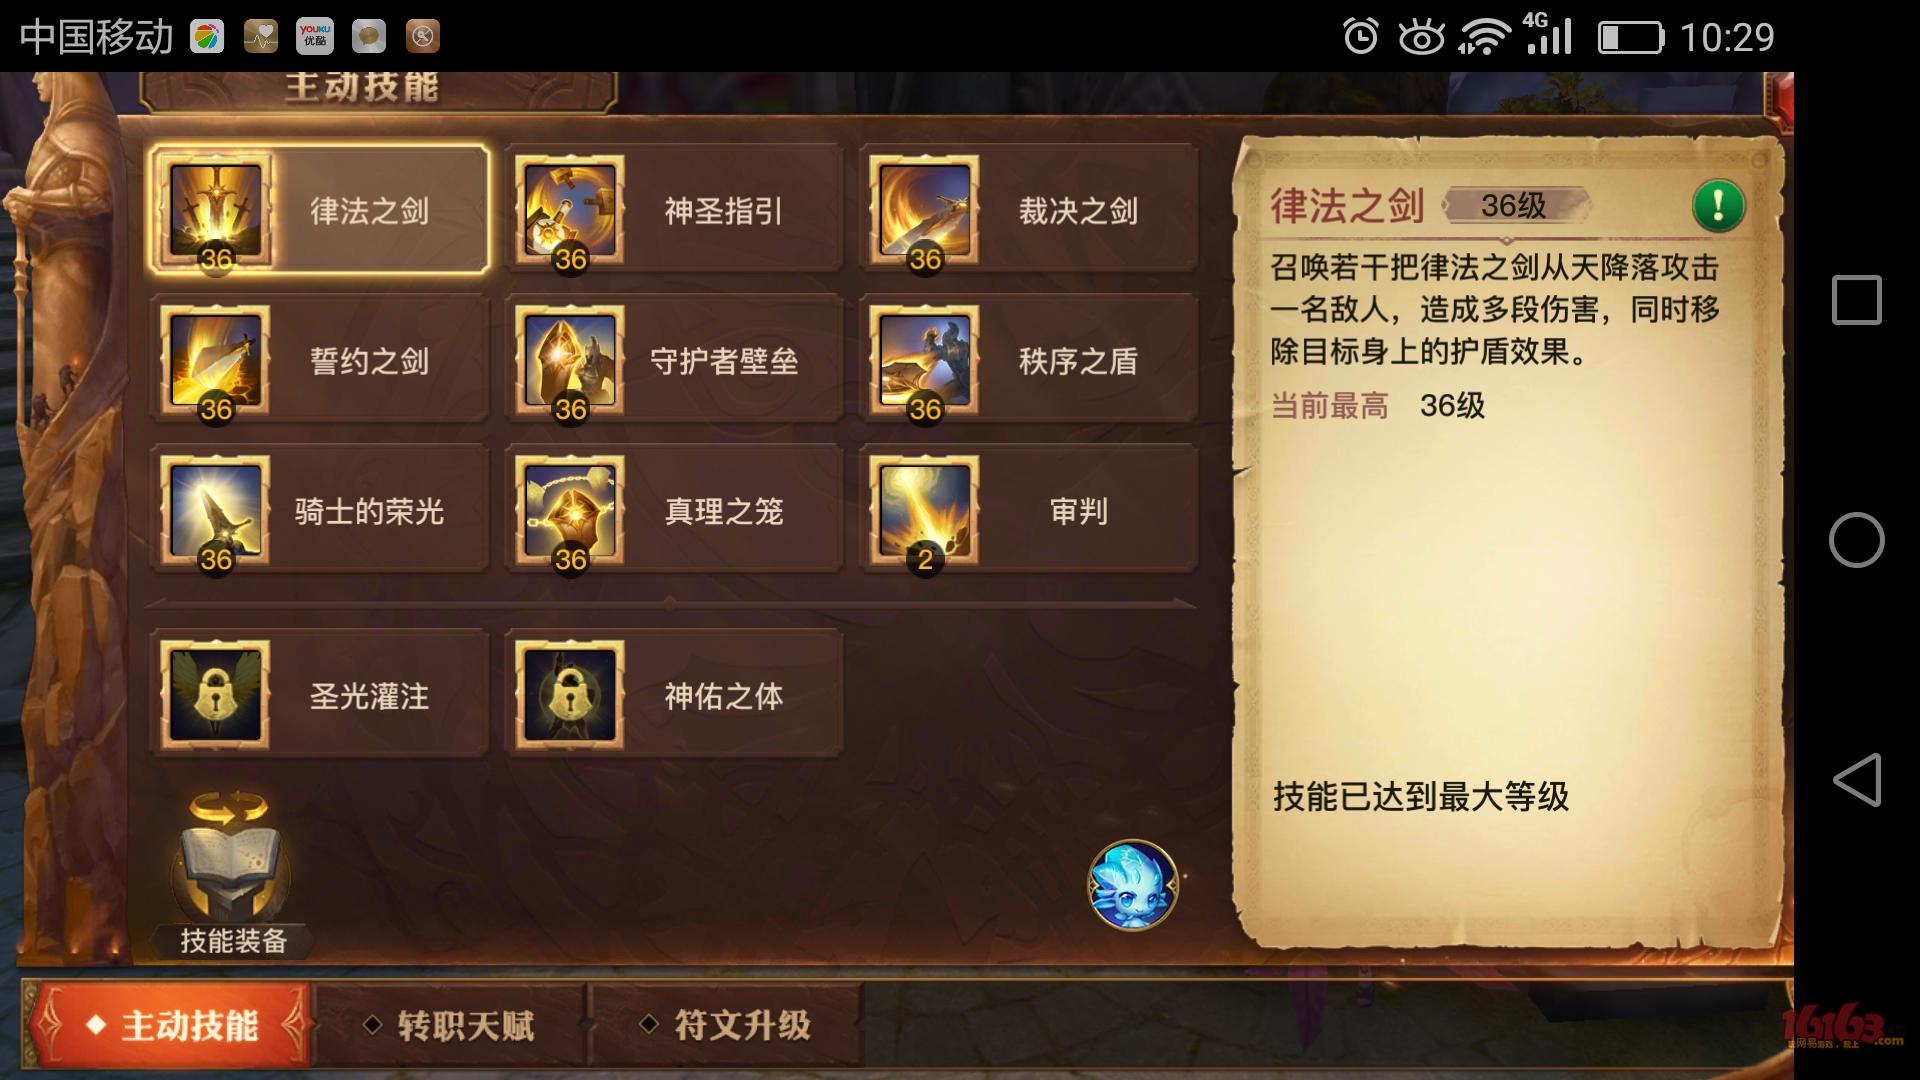 Screenshot_2018-05-10-10-29-50.png